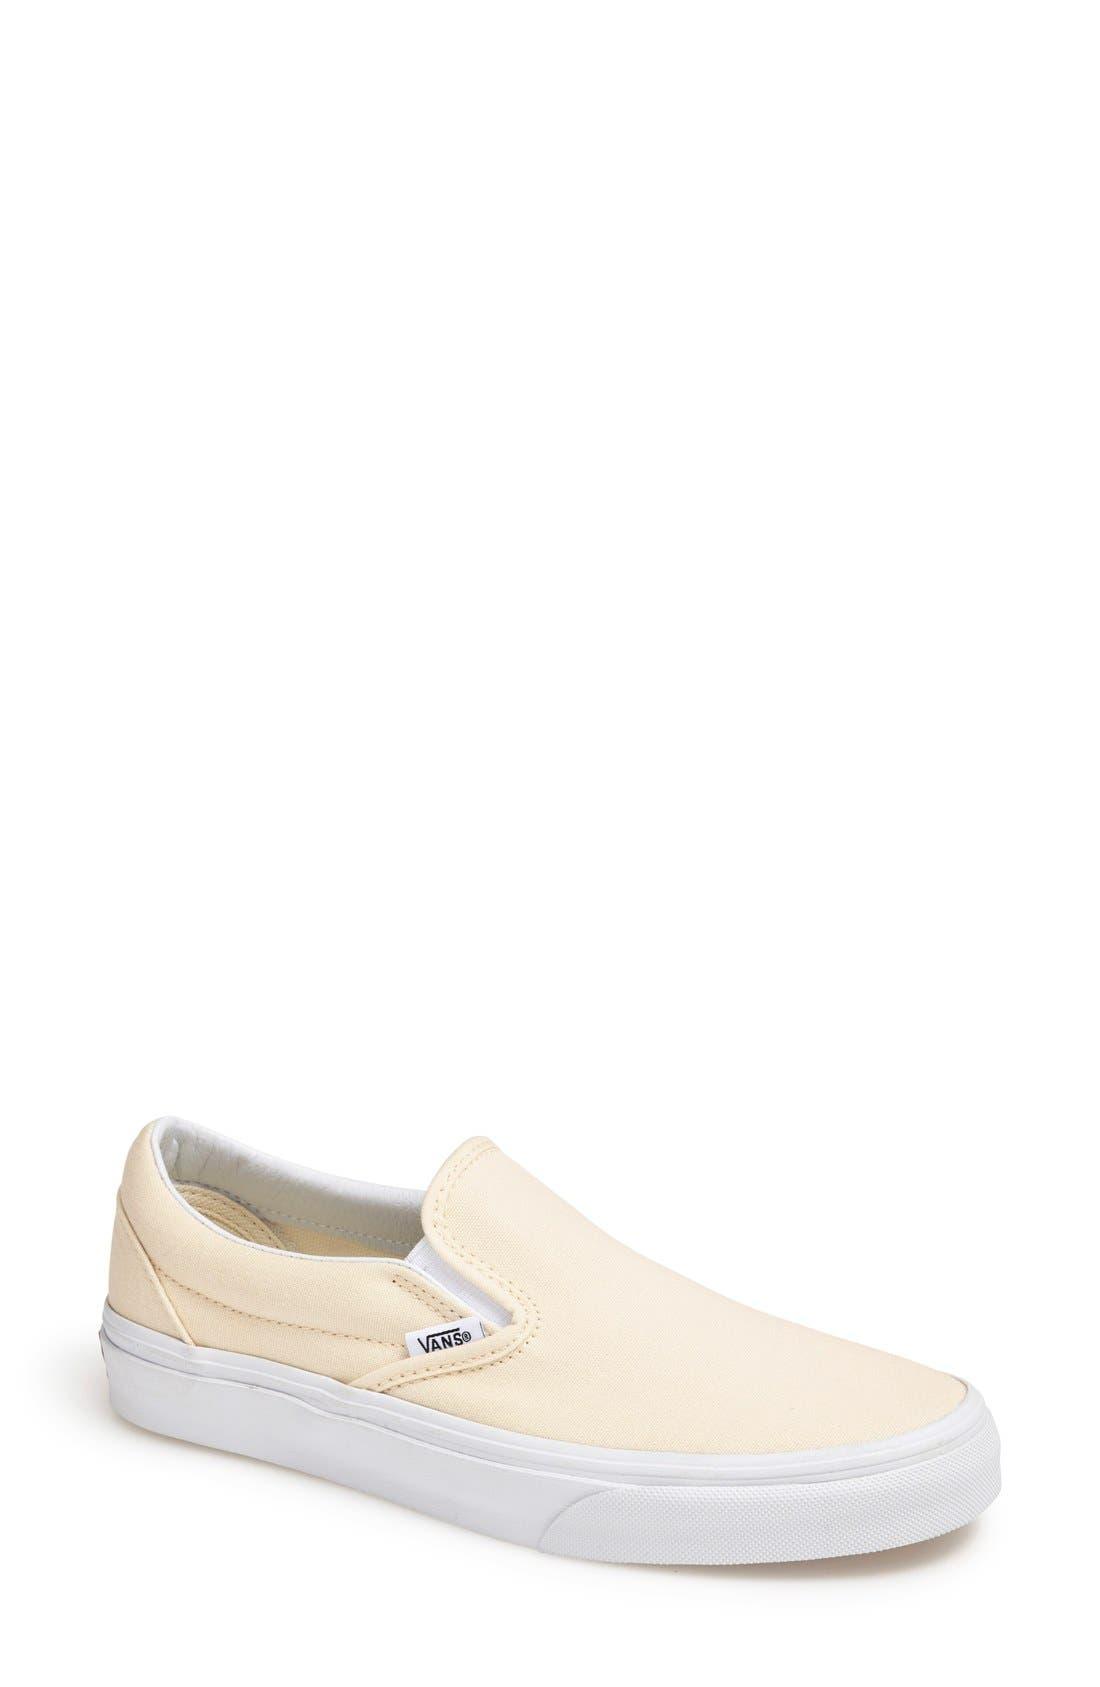 'Classic' Slip-On,                         Main,                         color, White